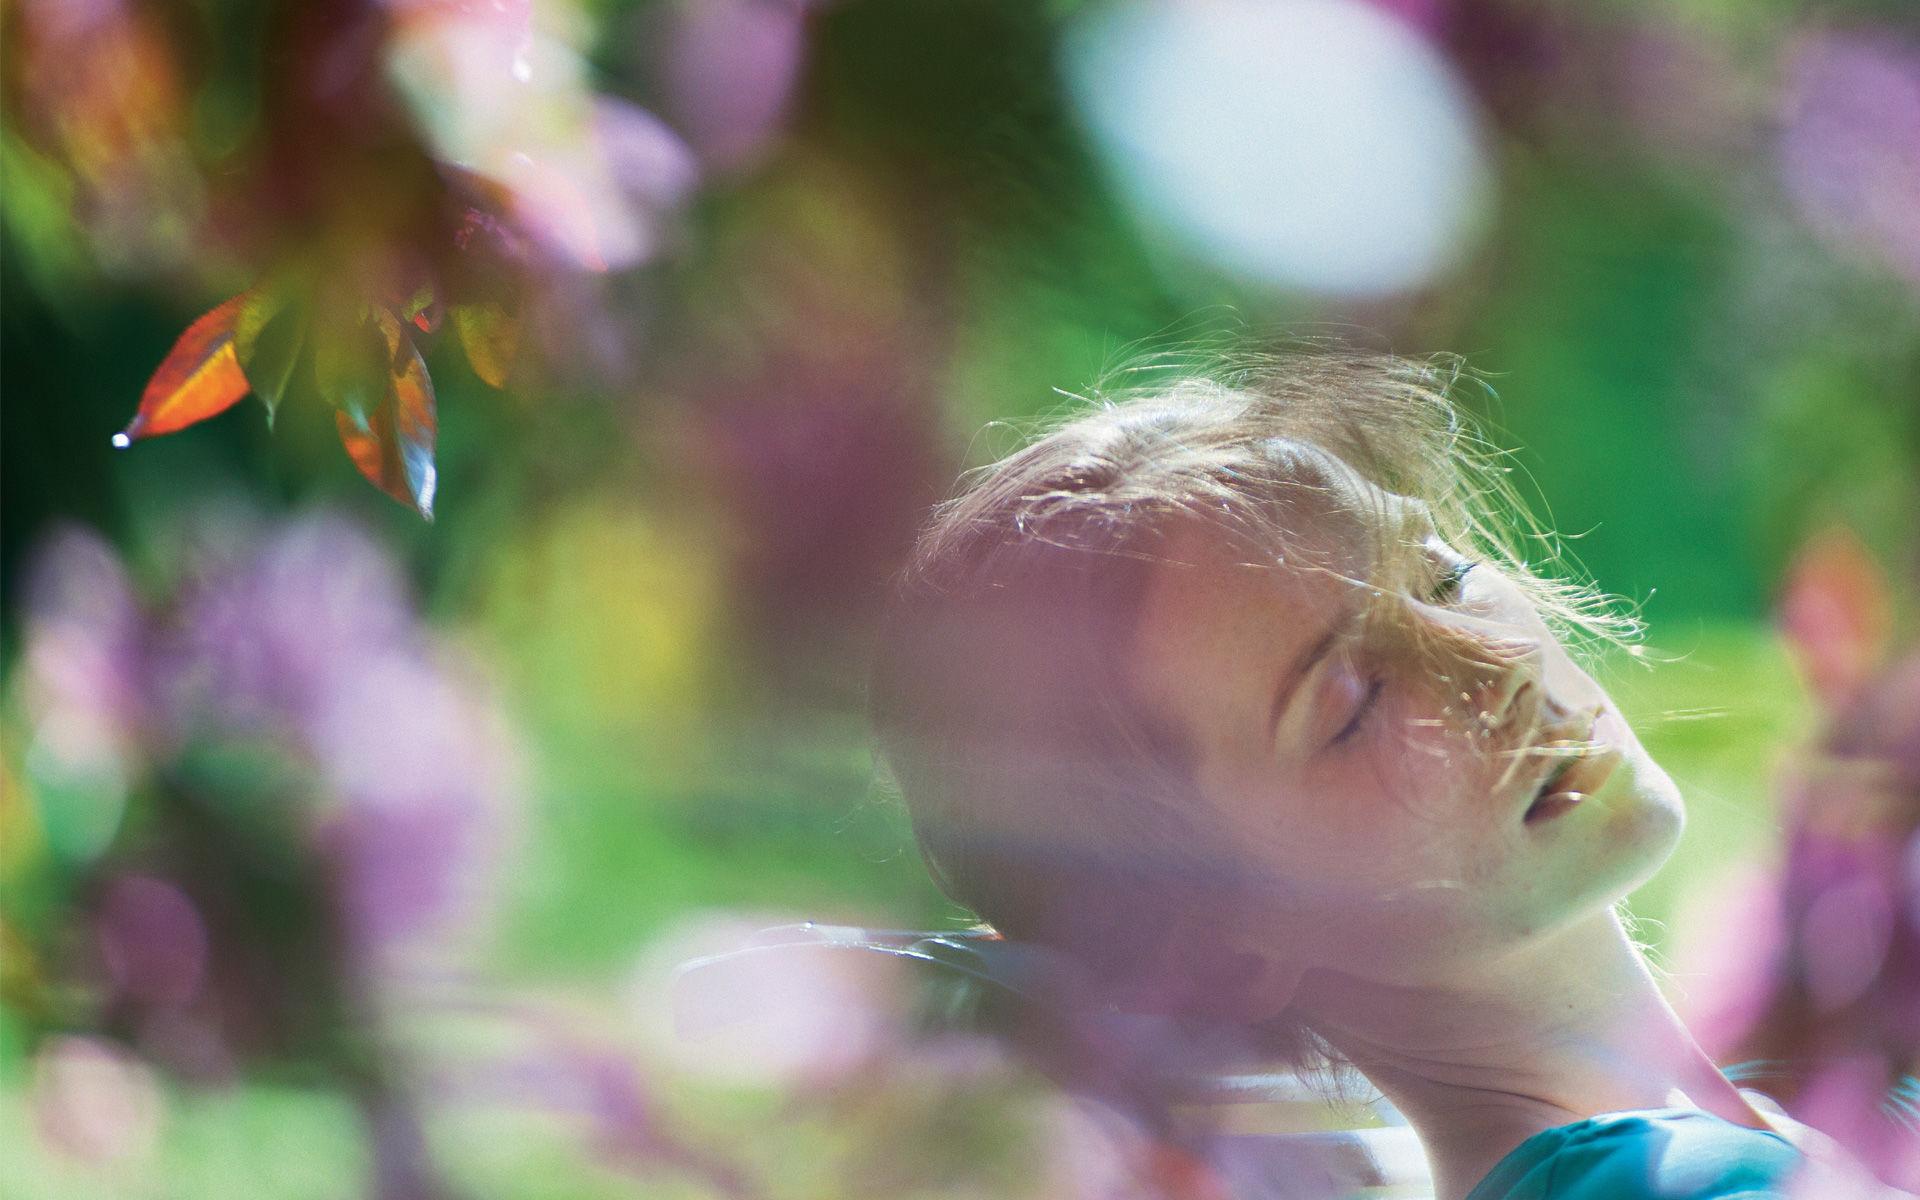 Frau entspannt im Luitpoldpark in Bad Kissingen